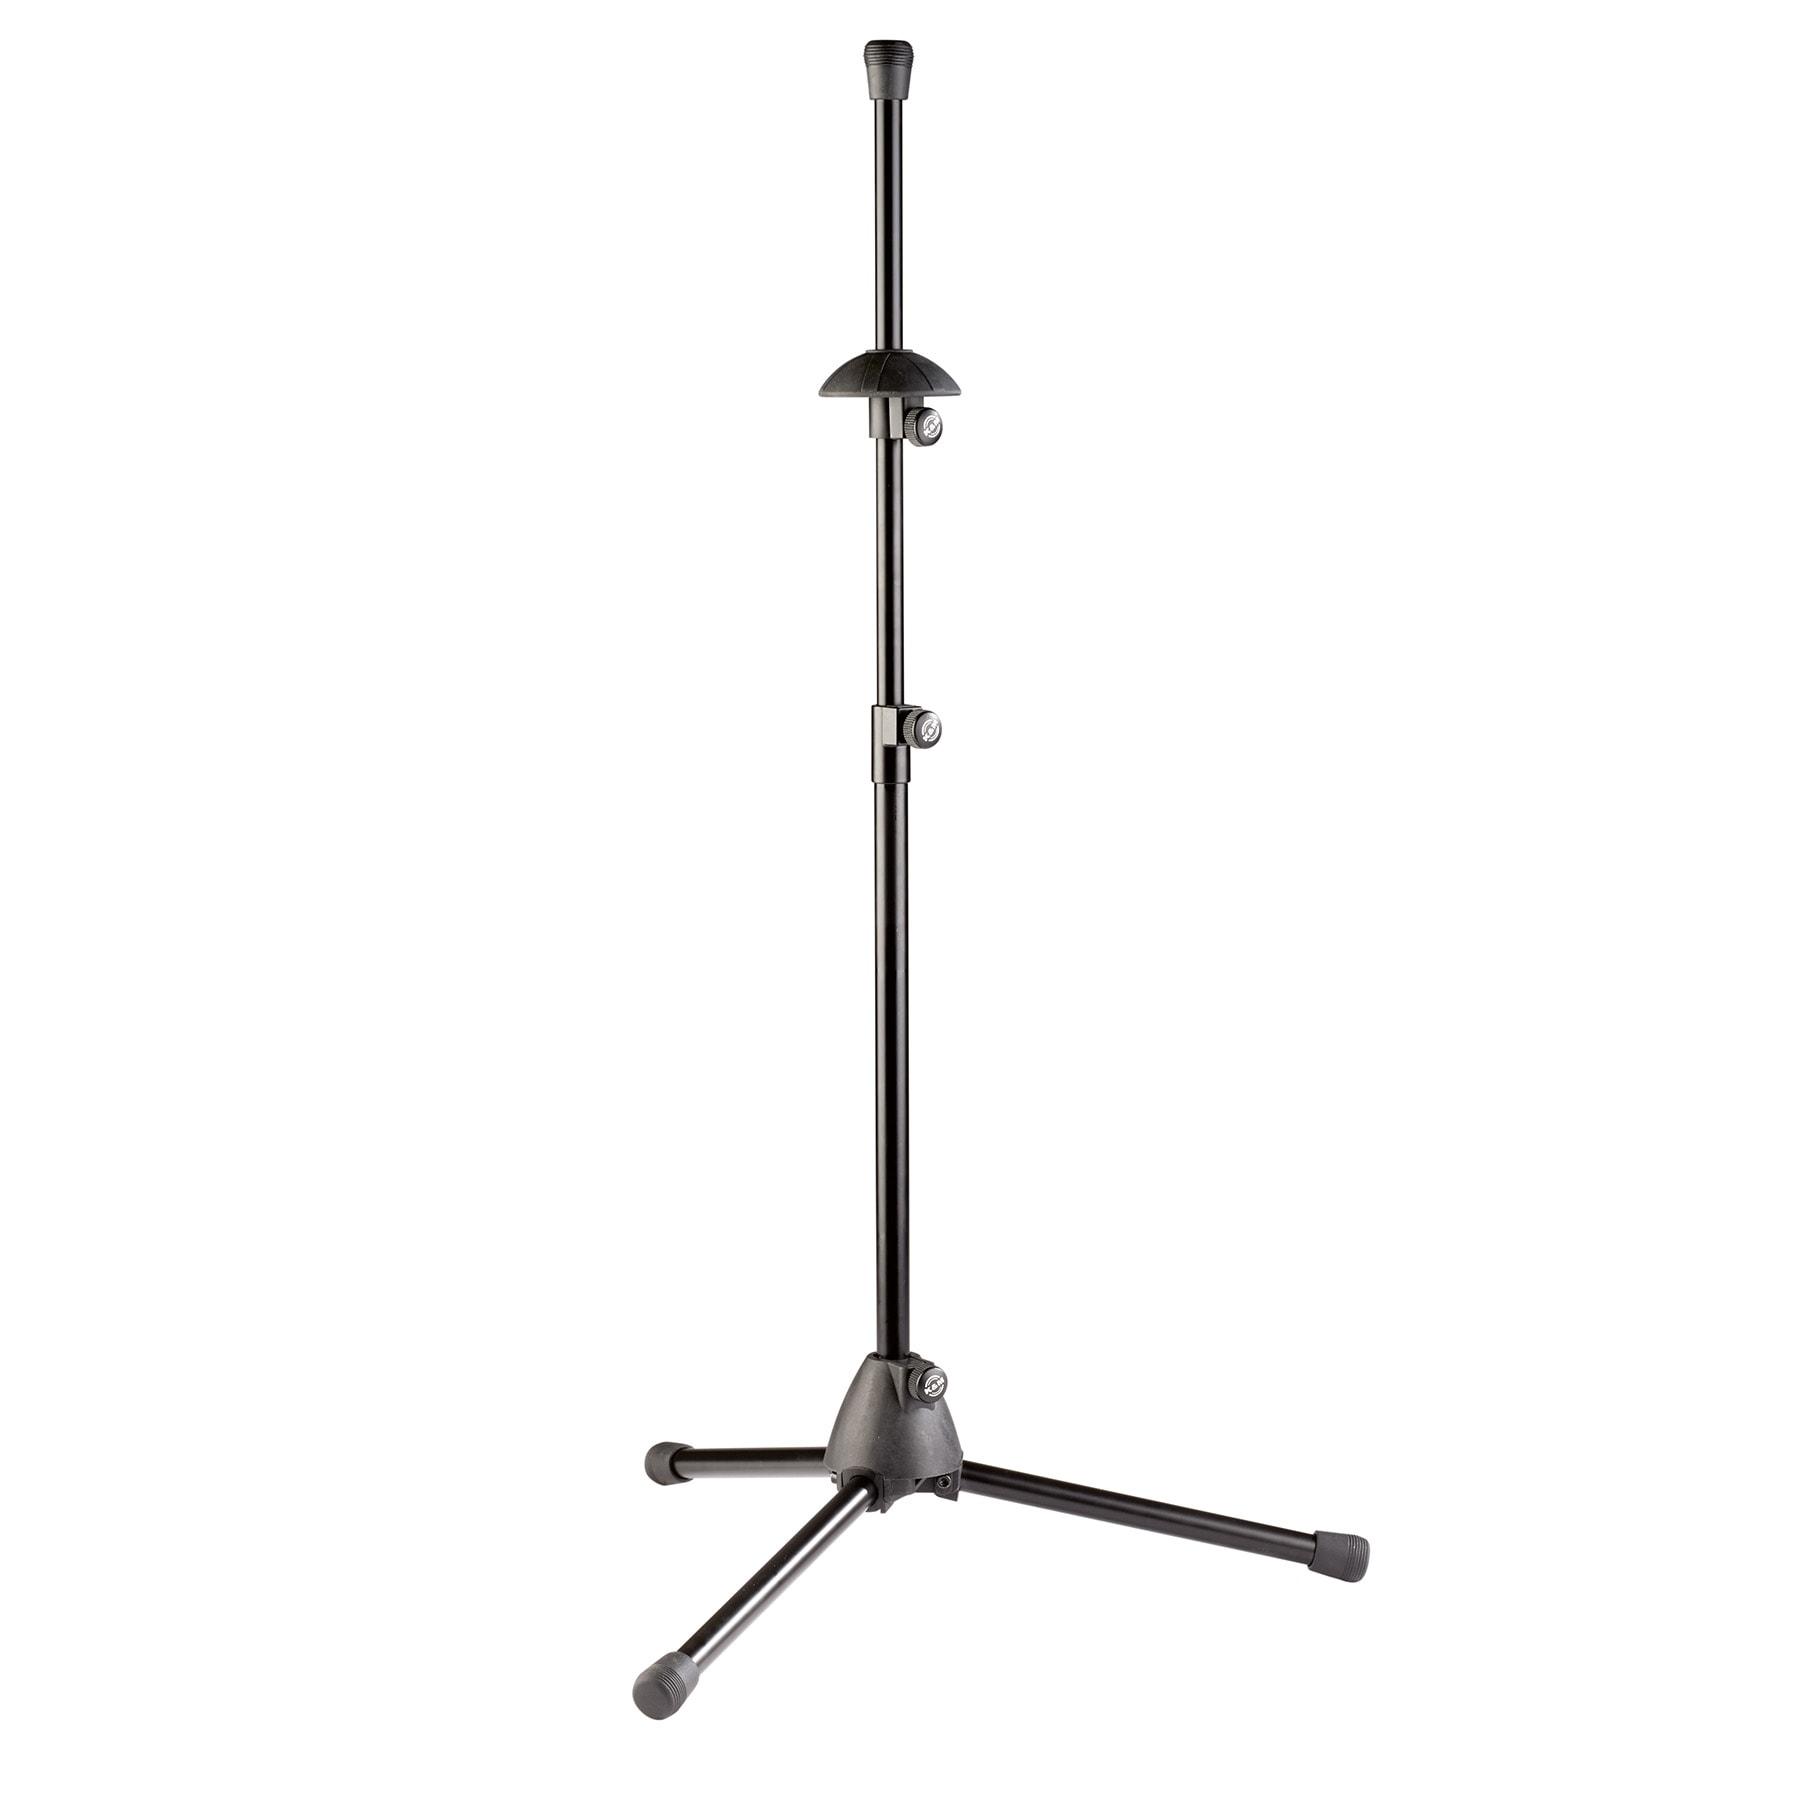 KM14985 - Trombone stand